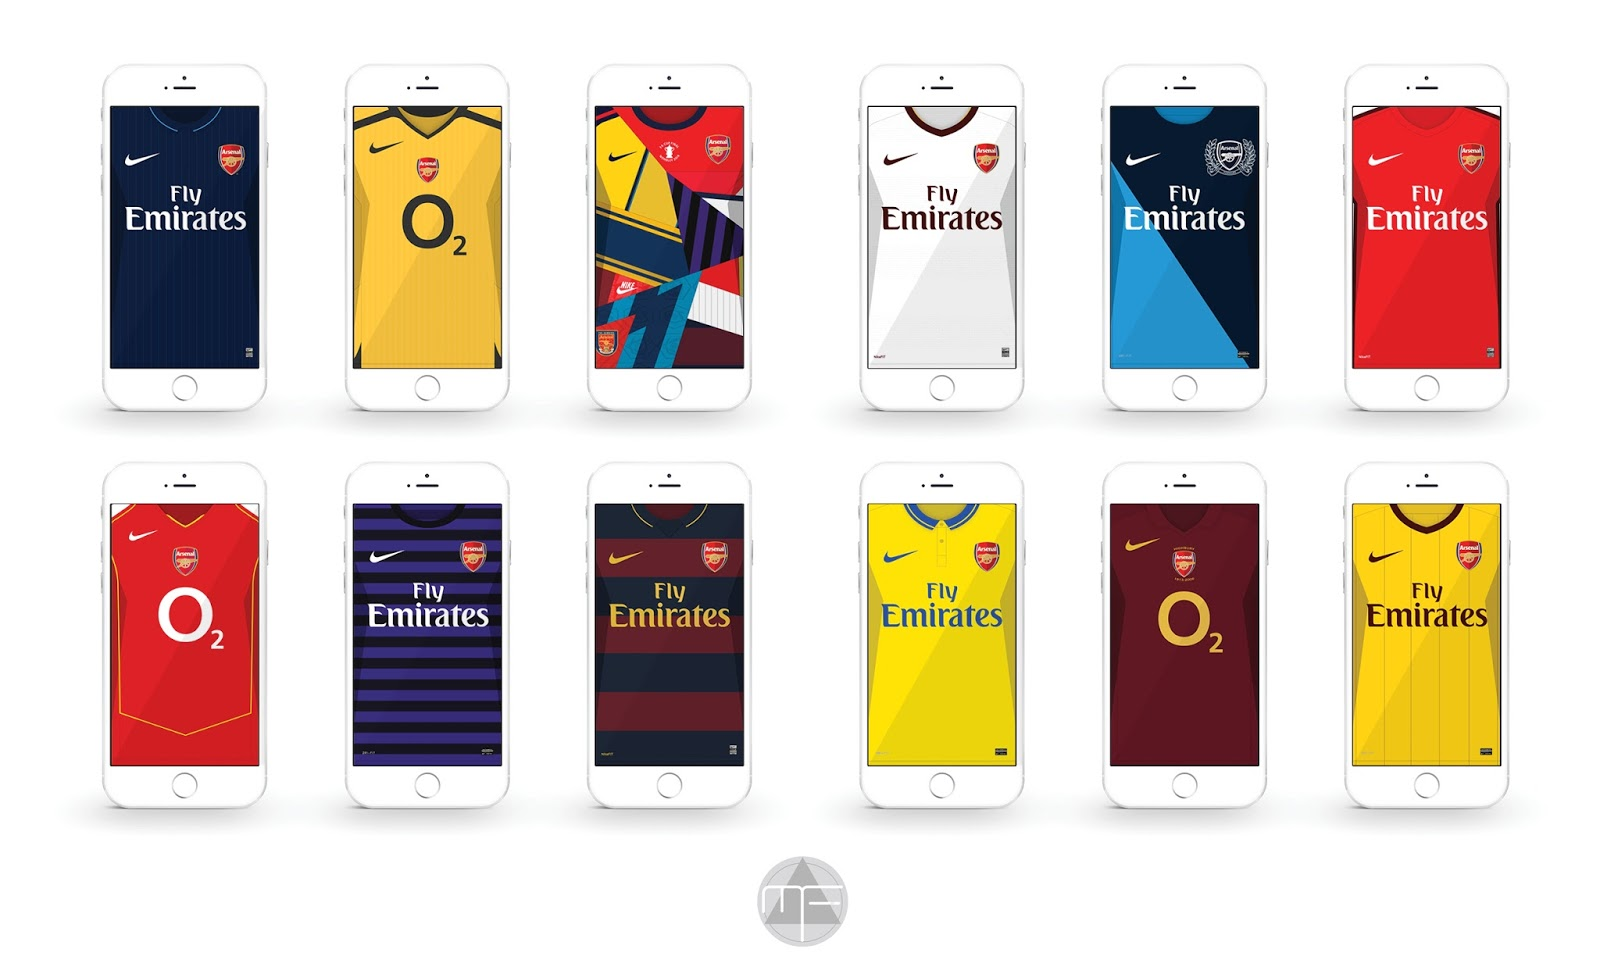 Wallpaper iphone arsenal - Coming Soon Arsenal Iphone 6 Wallpaper Set